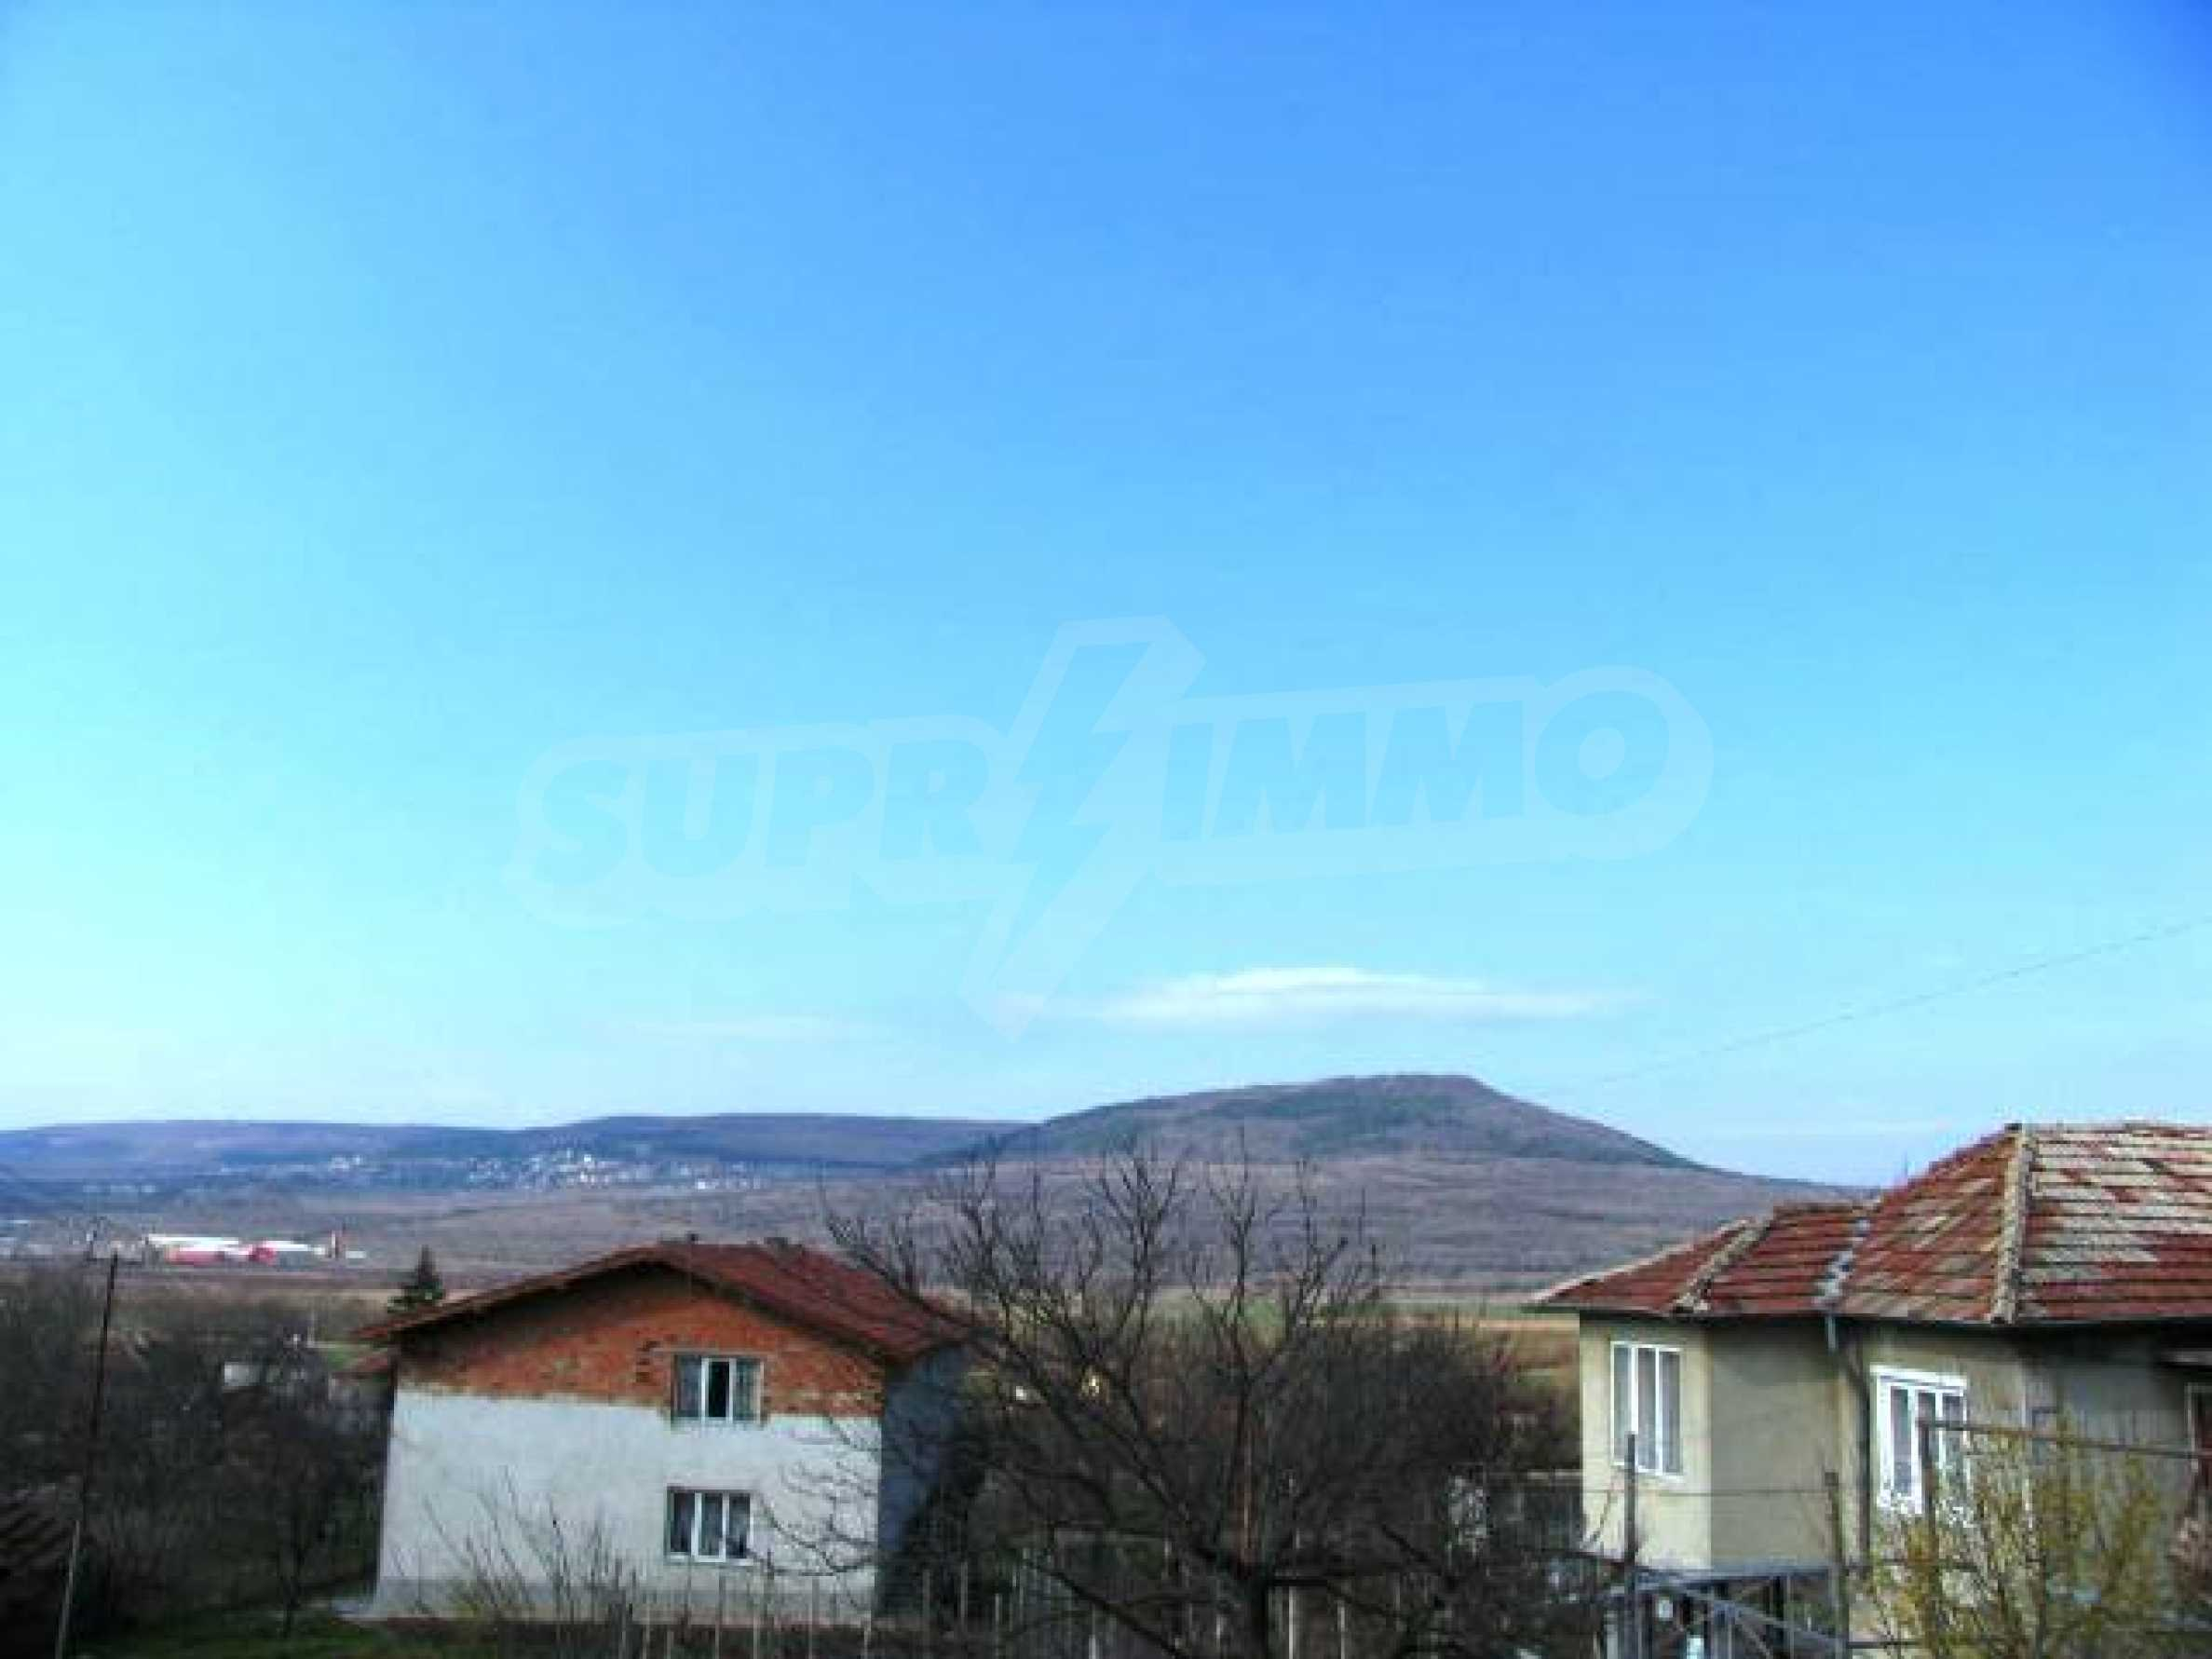 Land in Obrochishte Village, just 3km from Albena Resort  3